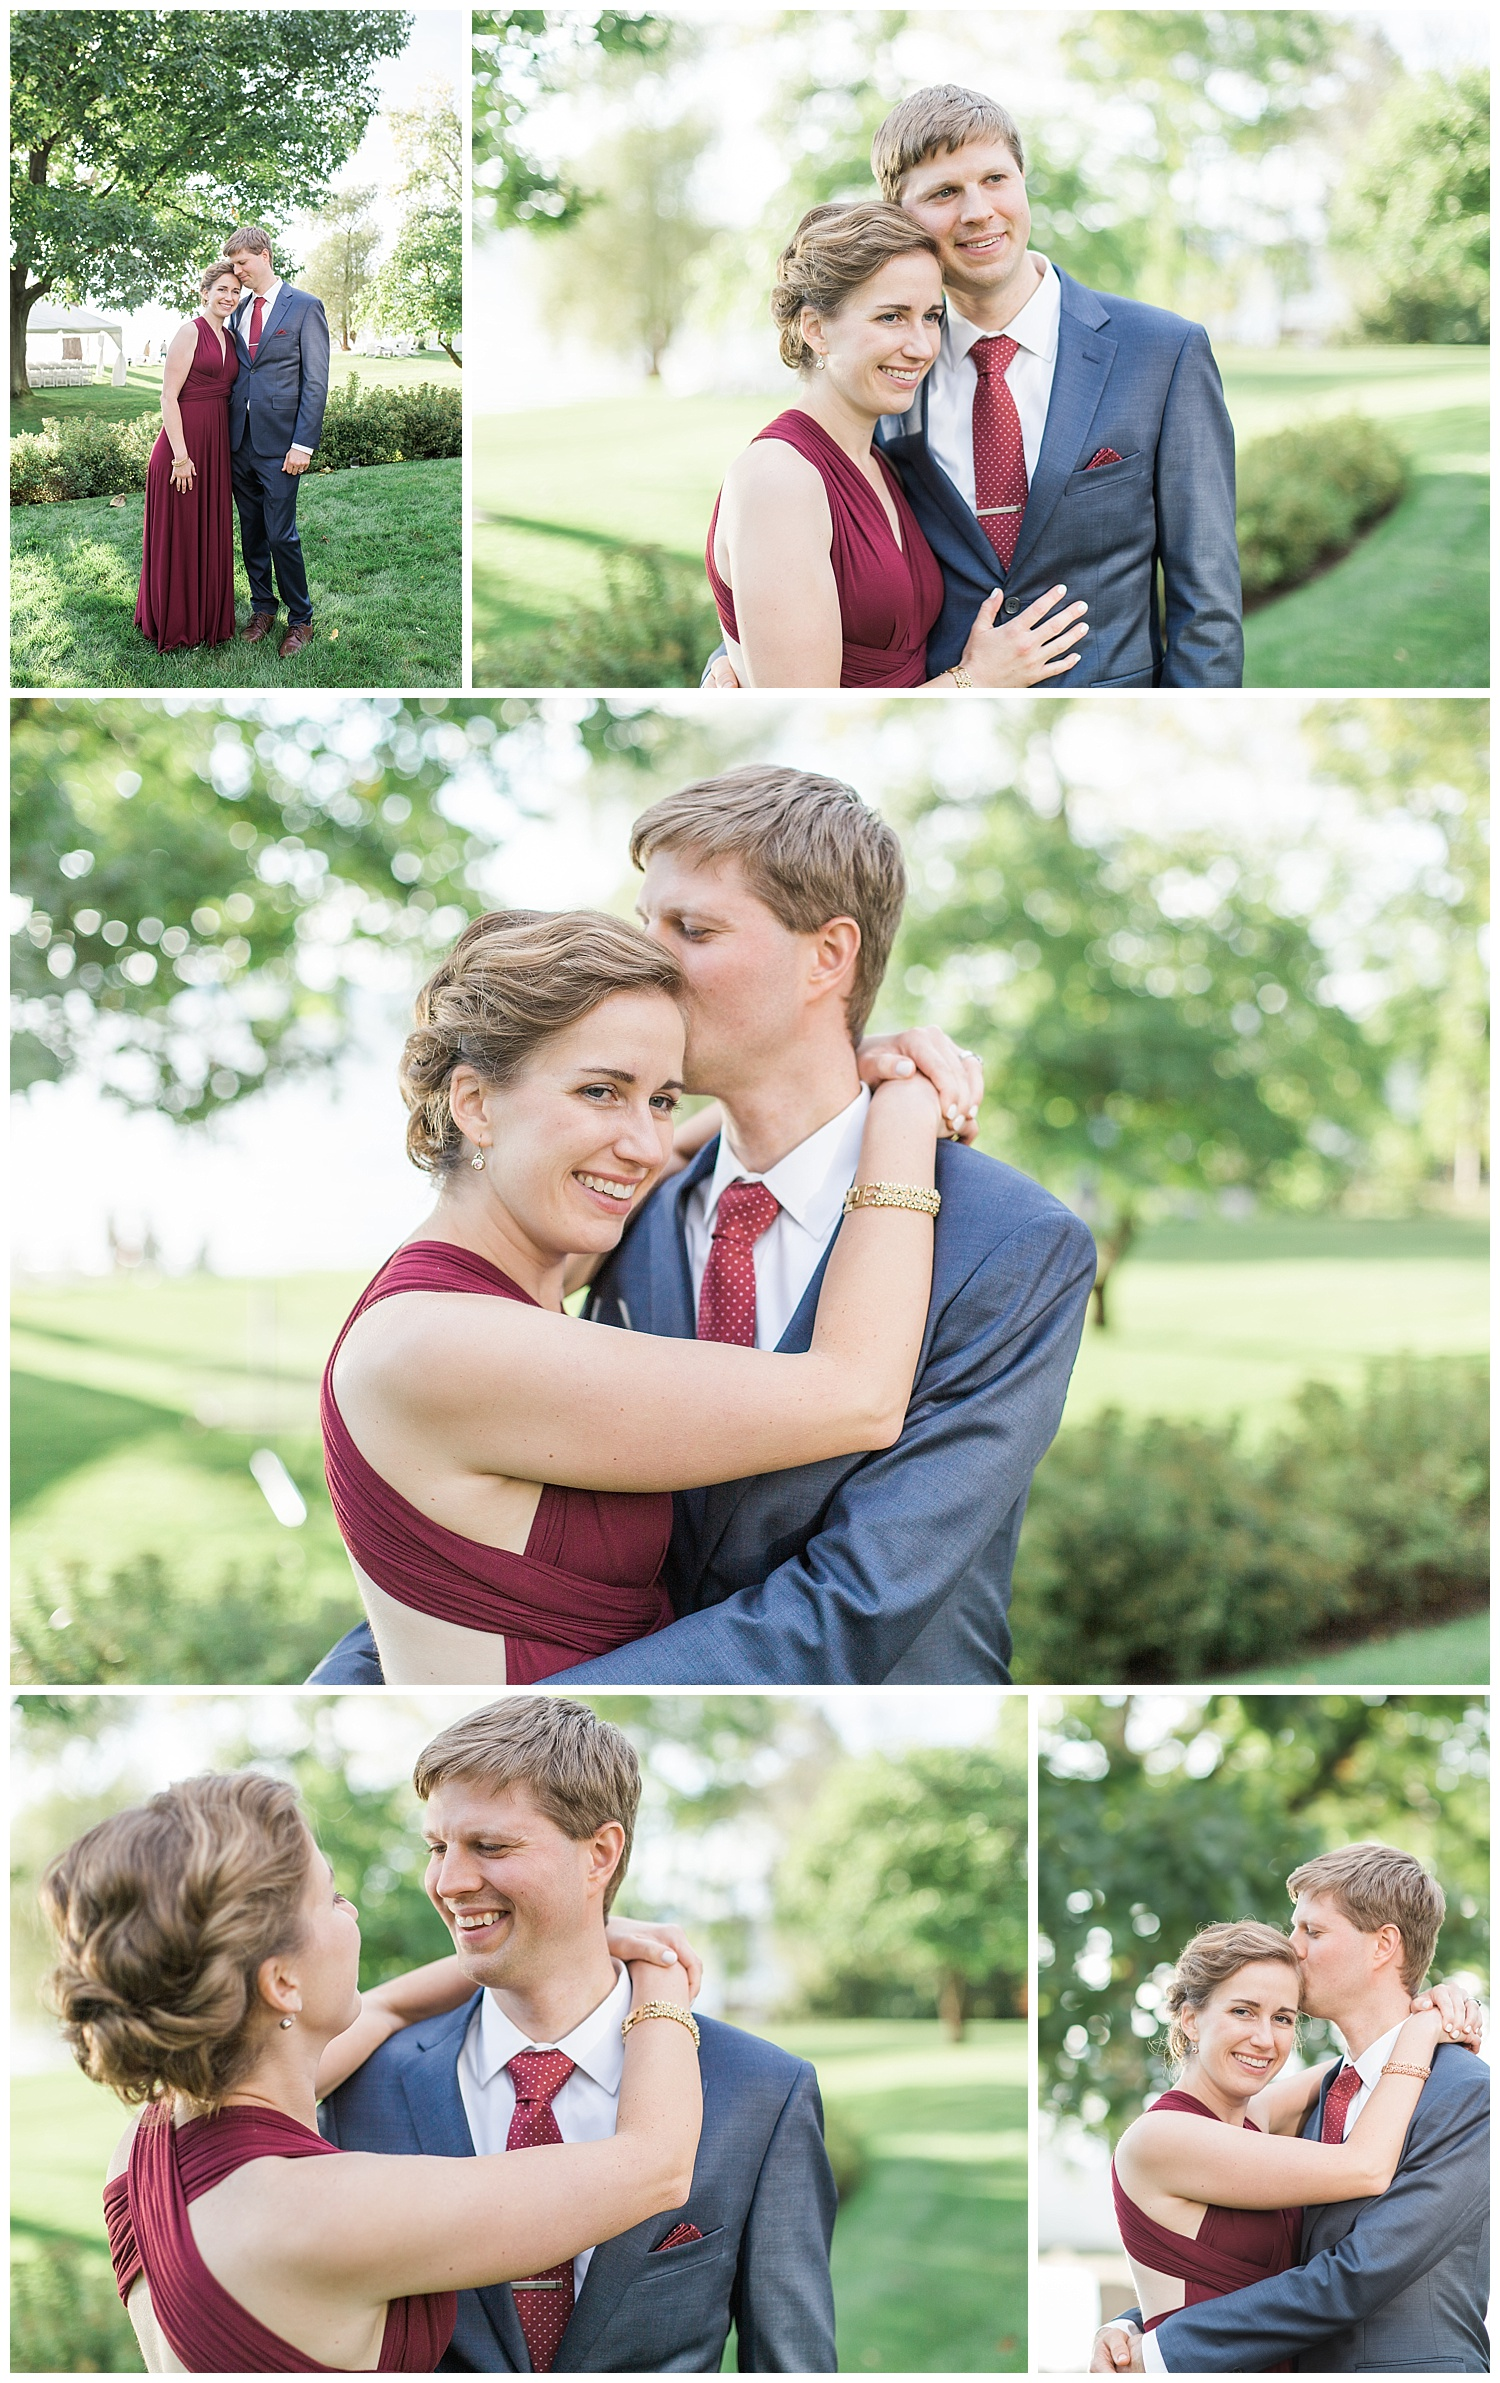 Margaret and Colin - Inns of Aurora - Lass and Beau-1441_Buffalo wedding photography.jpg